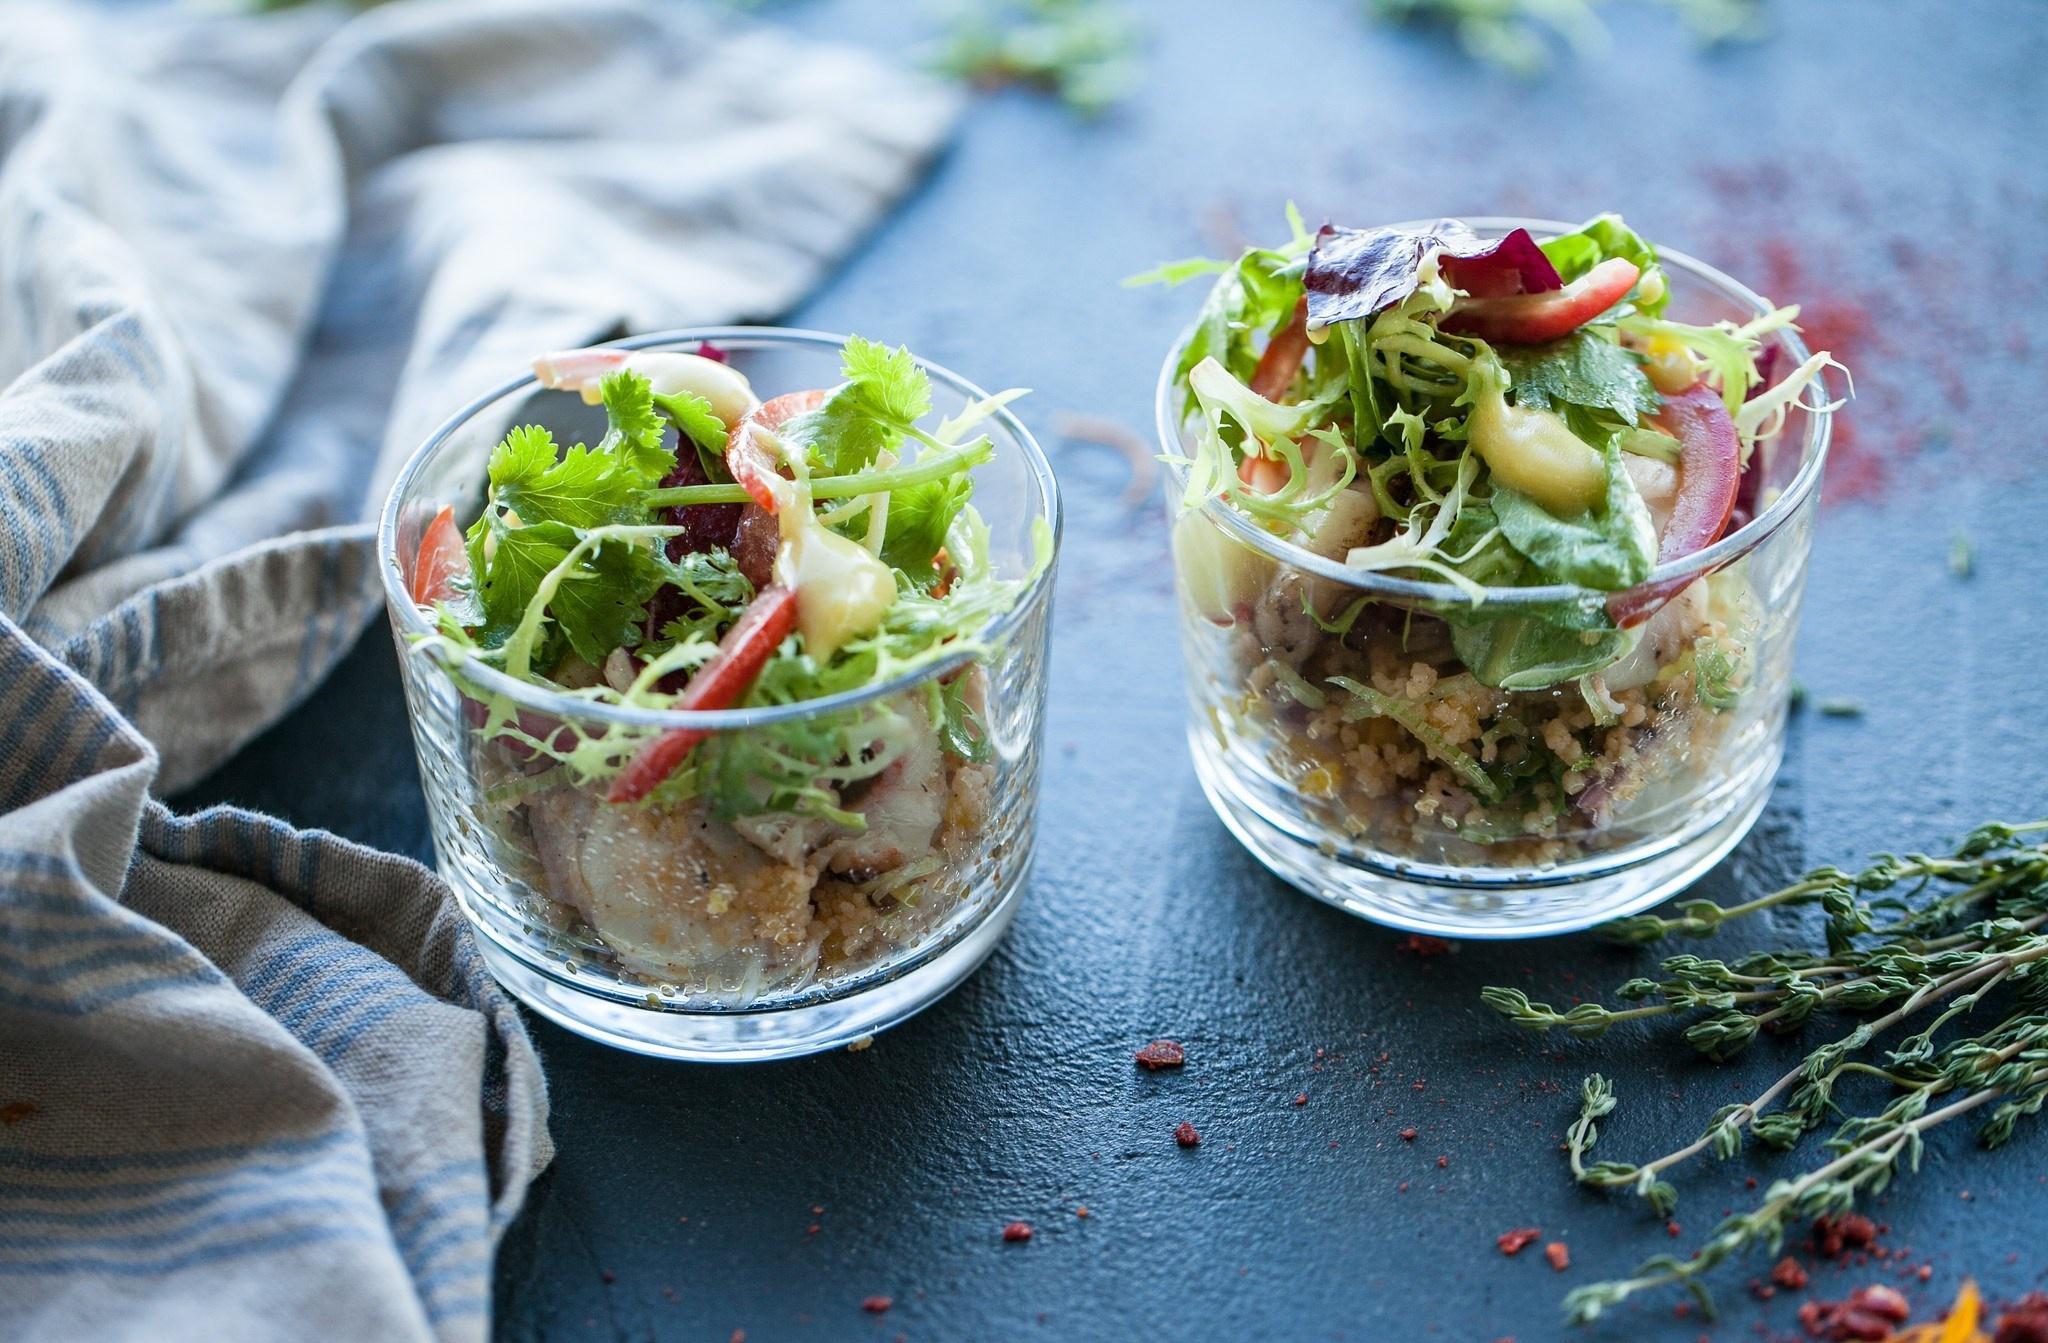 салаты в бокалах рецепты с фото элунда-это